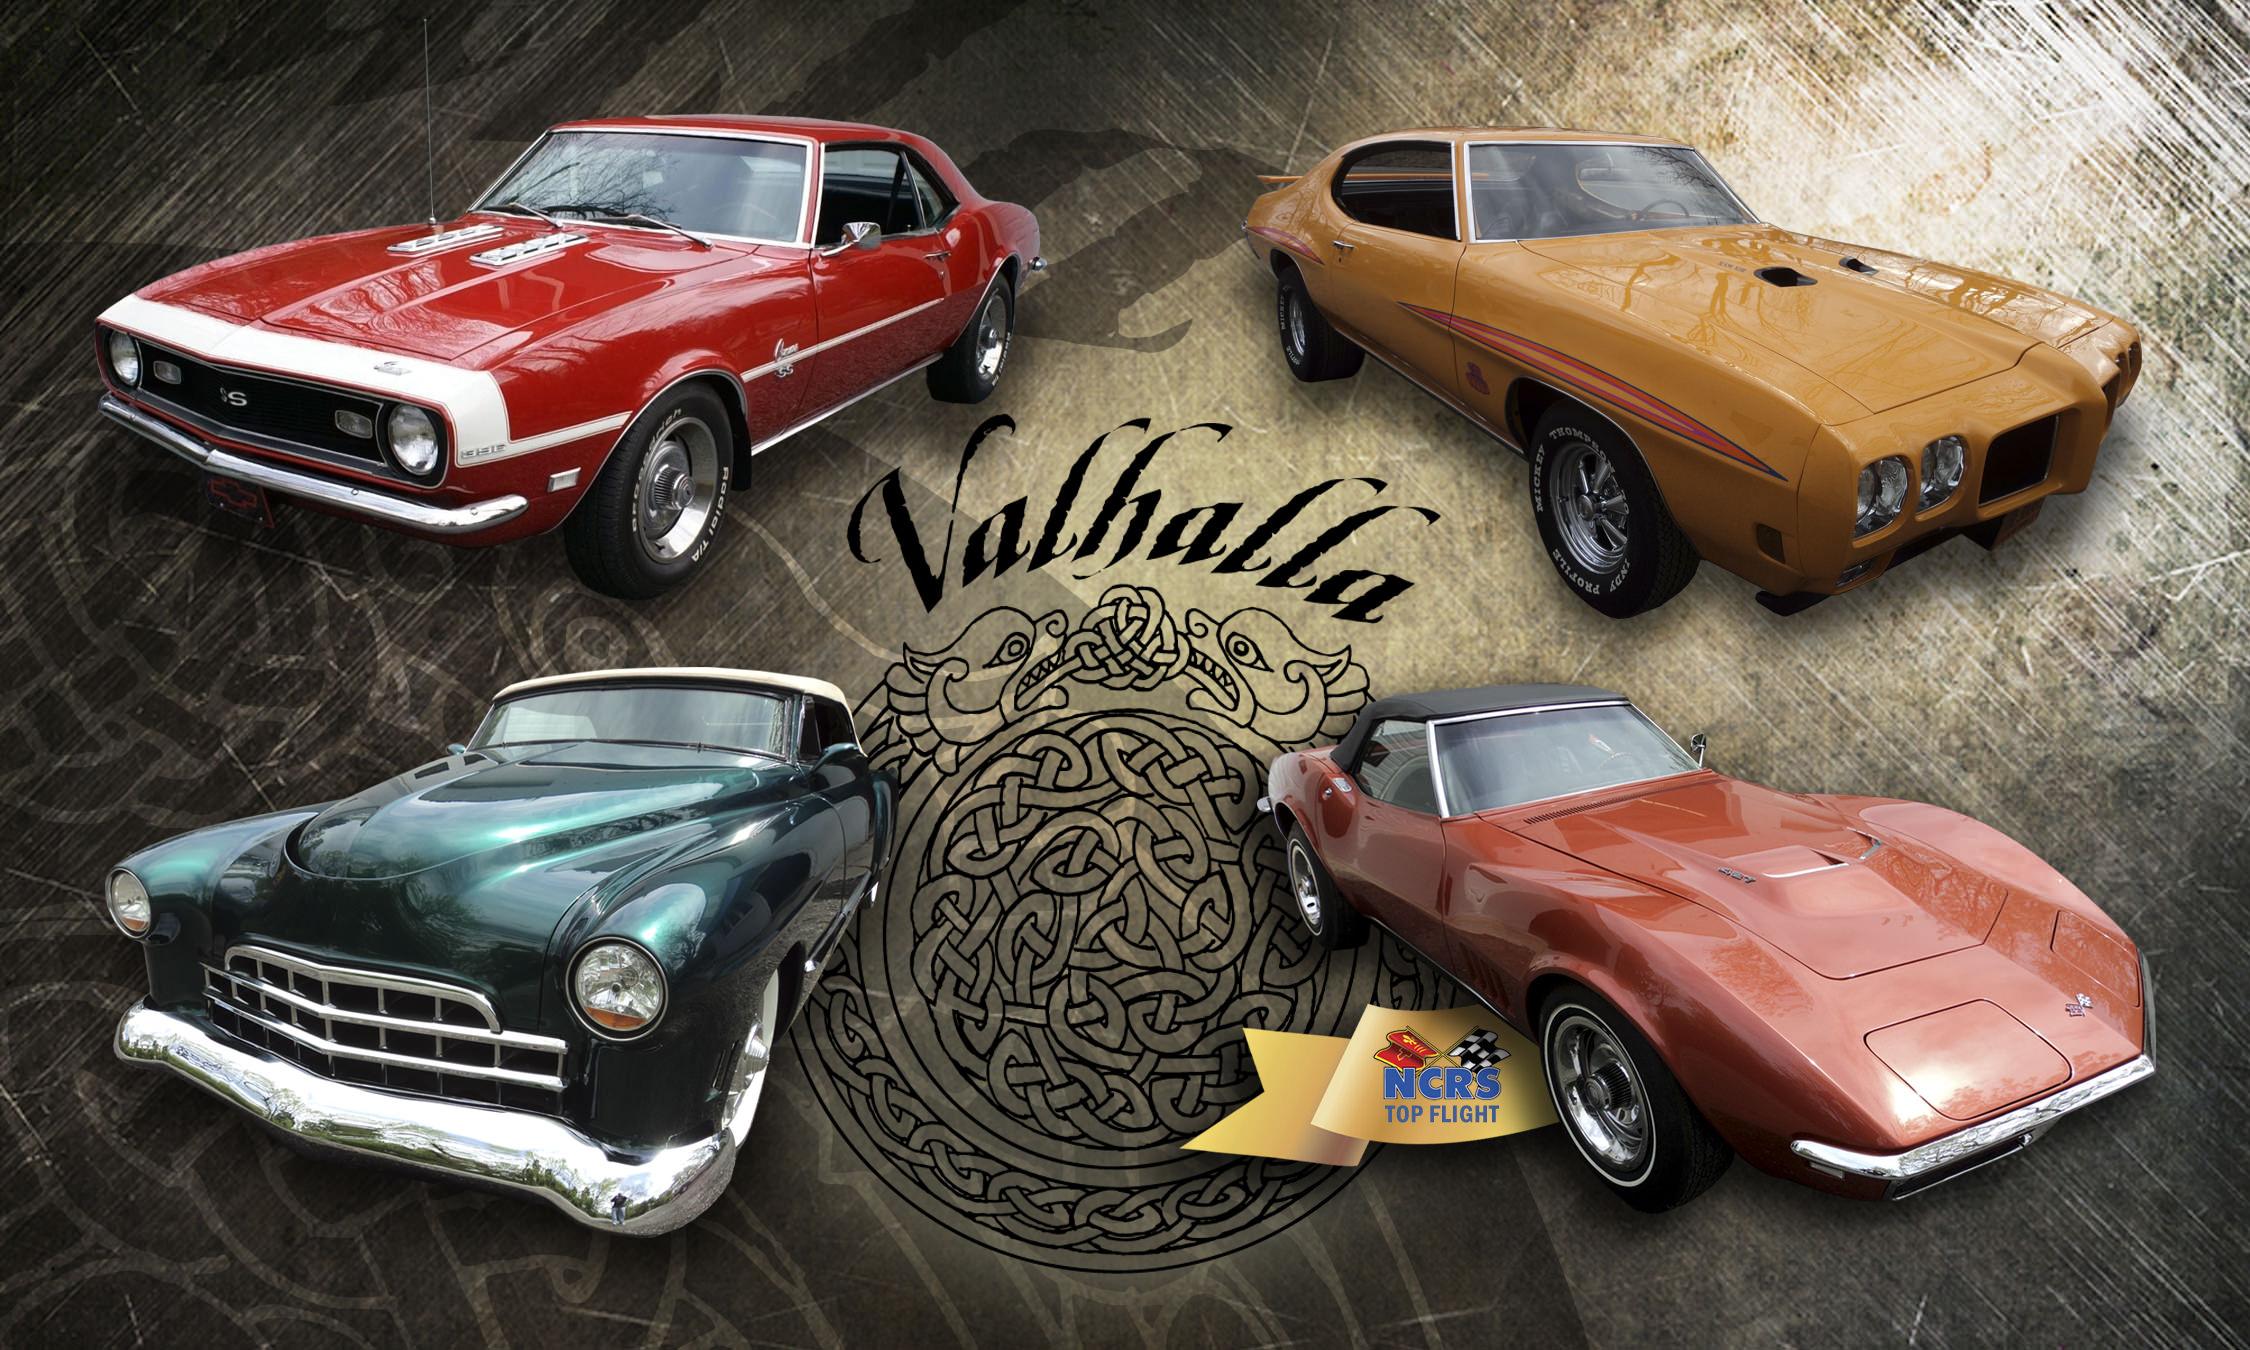 North Jersey Valhalla Auto Restoration & Fabrication Is In ...